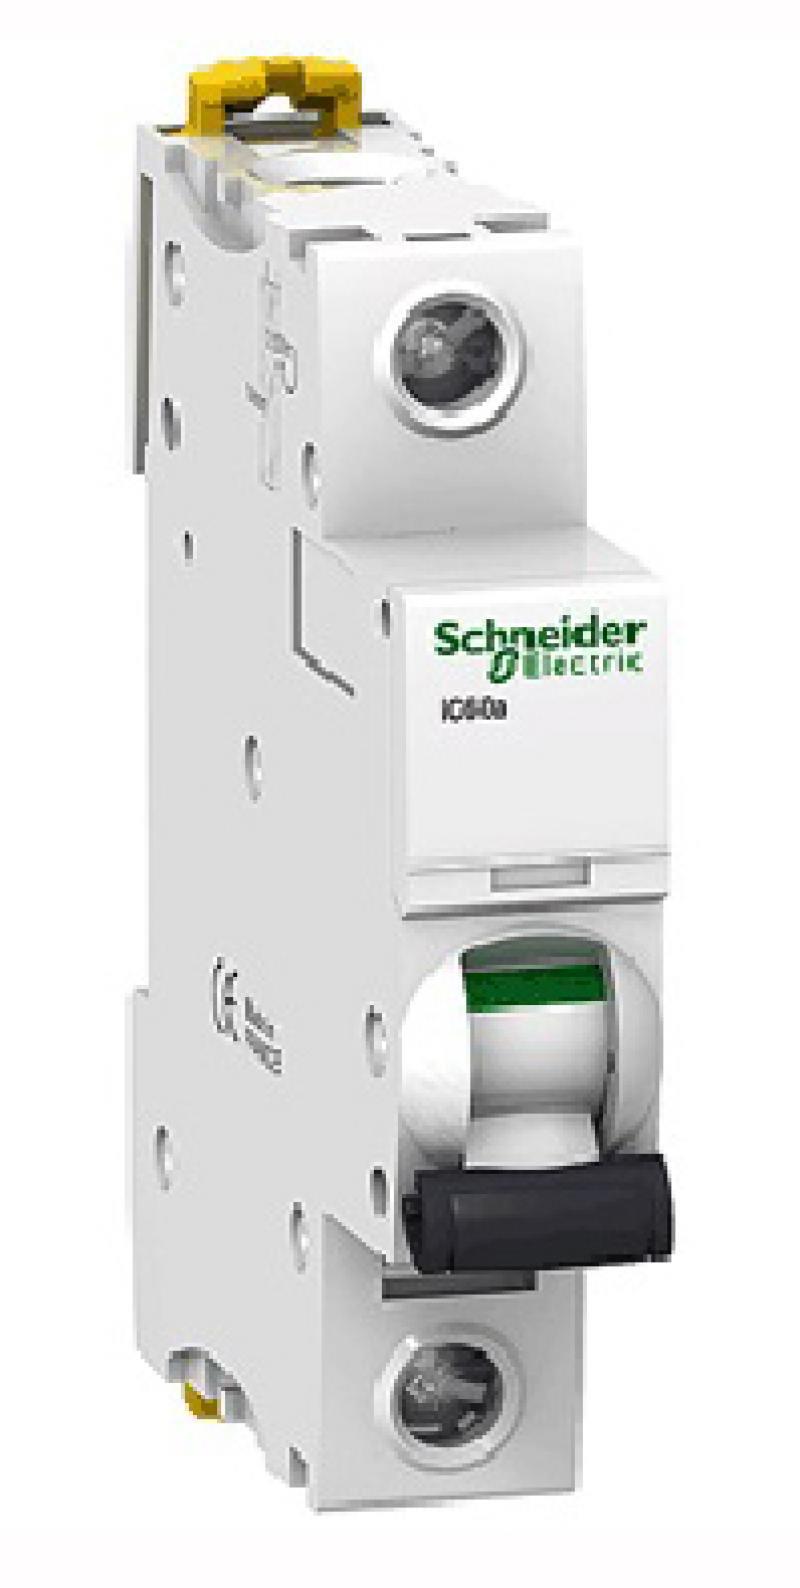 Автоматический выключатель Schneider Electric iC60N 1П 50A C A9F79150 панель лицевая schneider electric actassi 1 модуль белый 24 шт vdi88240